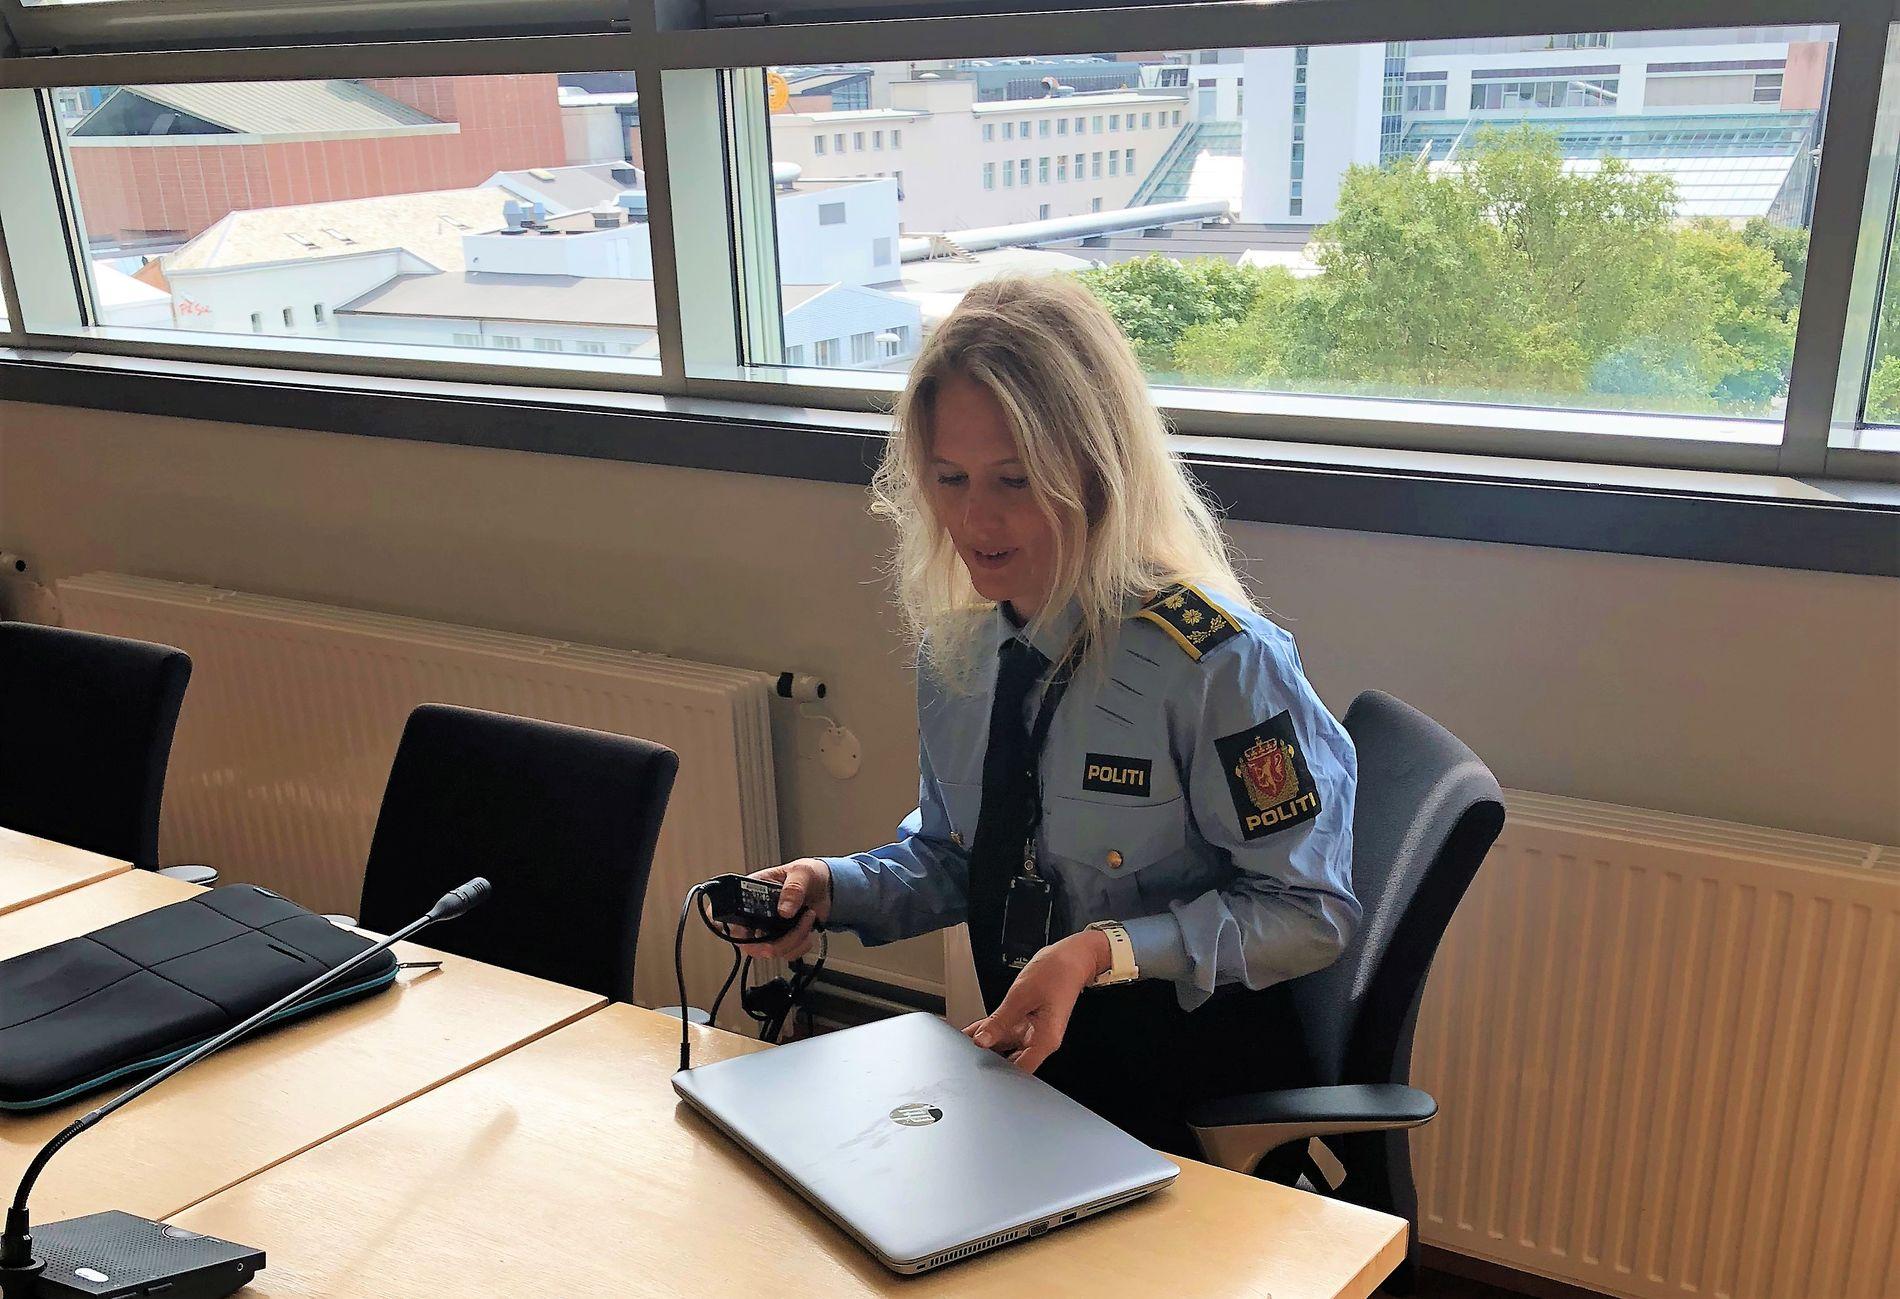 POLITIADVOKAT: Marte Benedicte Engesli Lysaker.